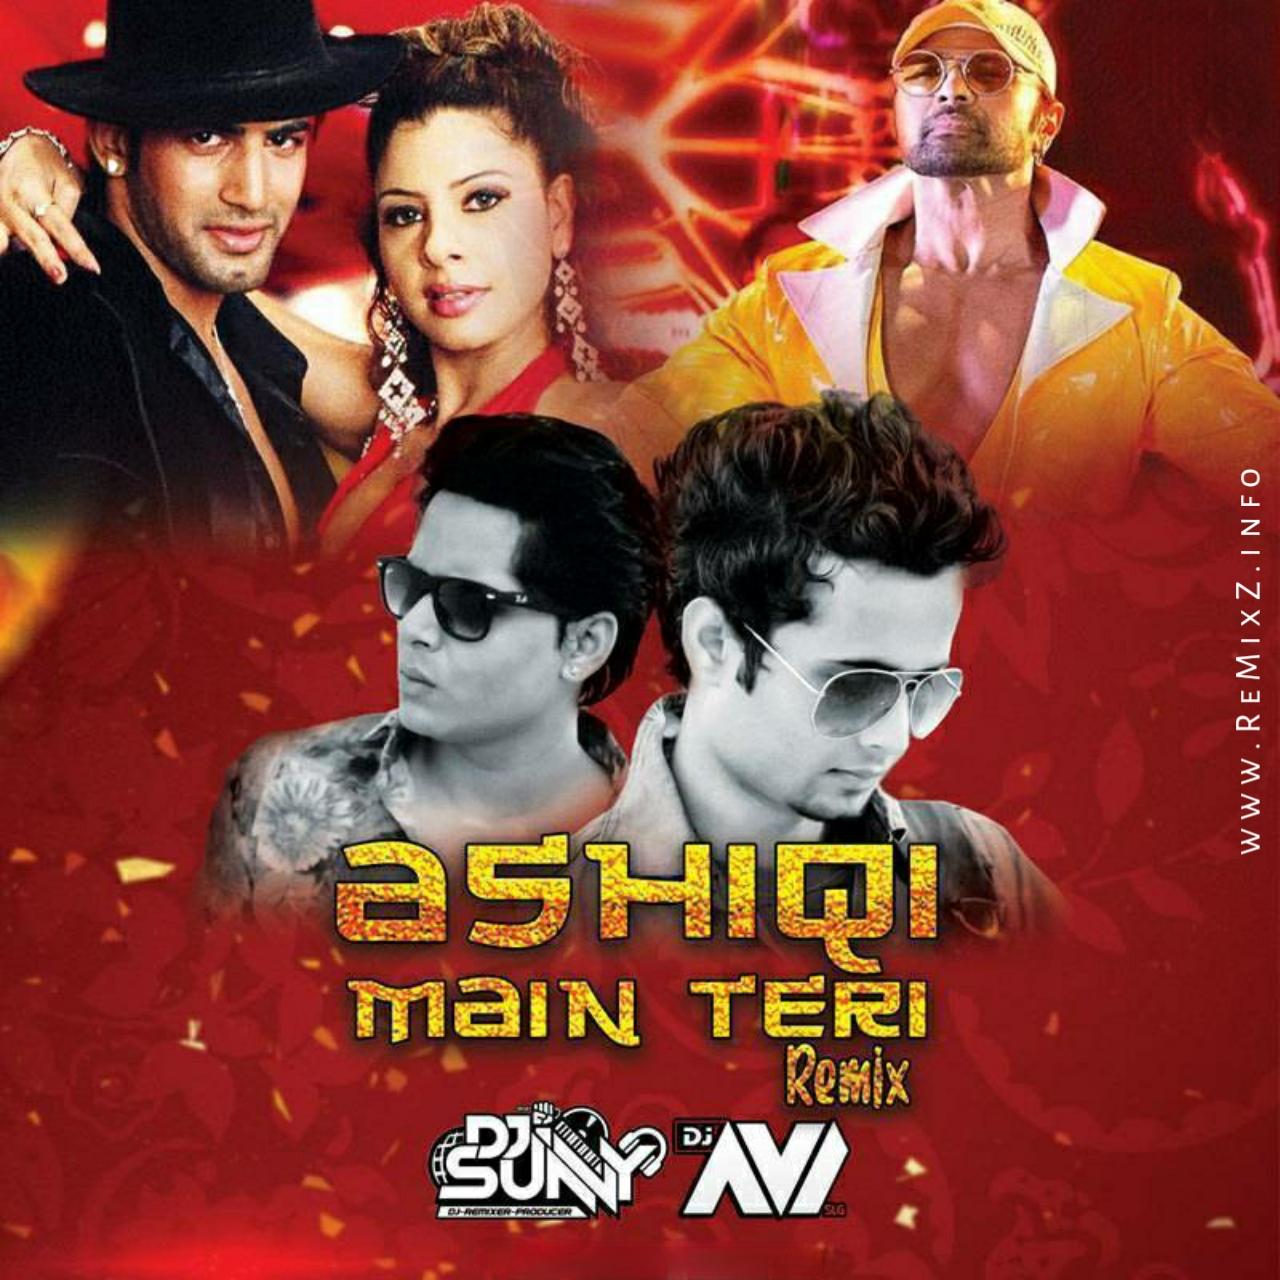 ashiqi-main-teri-remix-dj-sunny-x-dj-avi.jpg